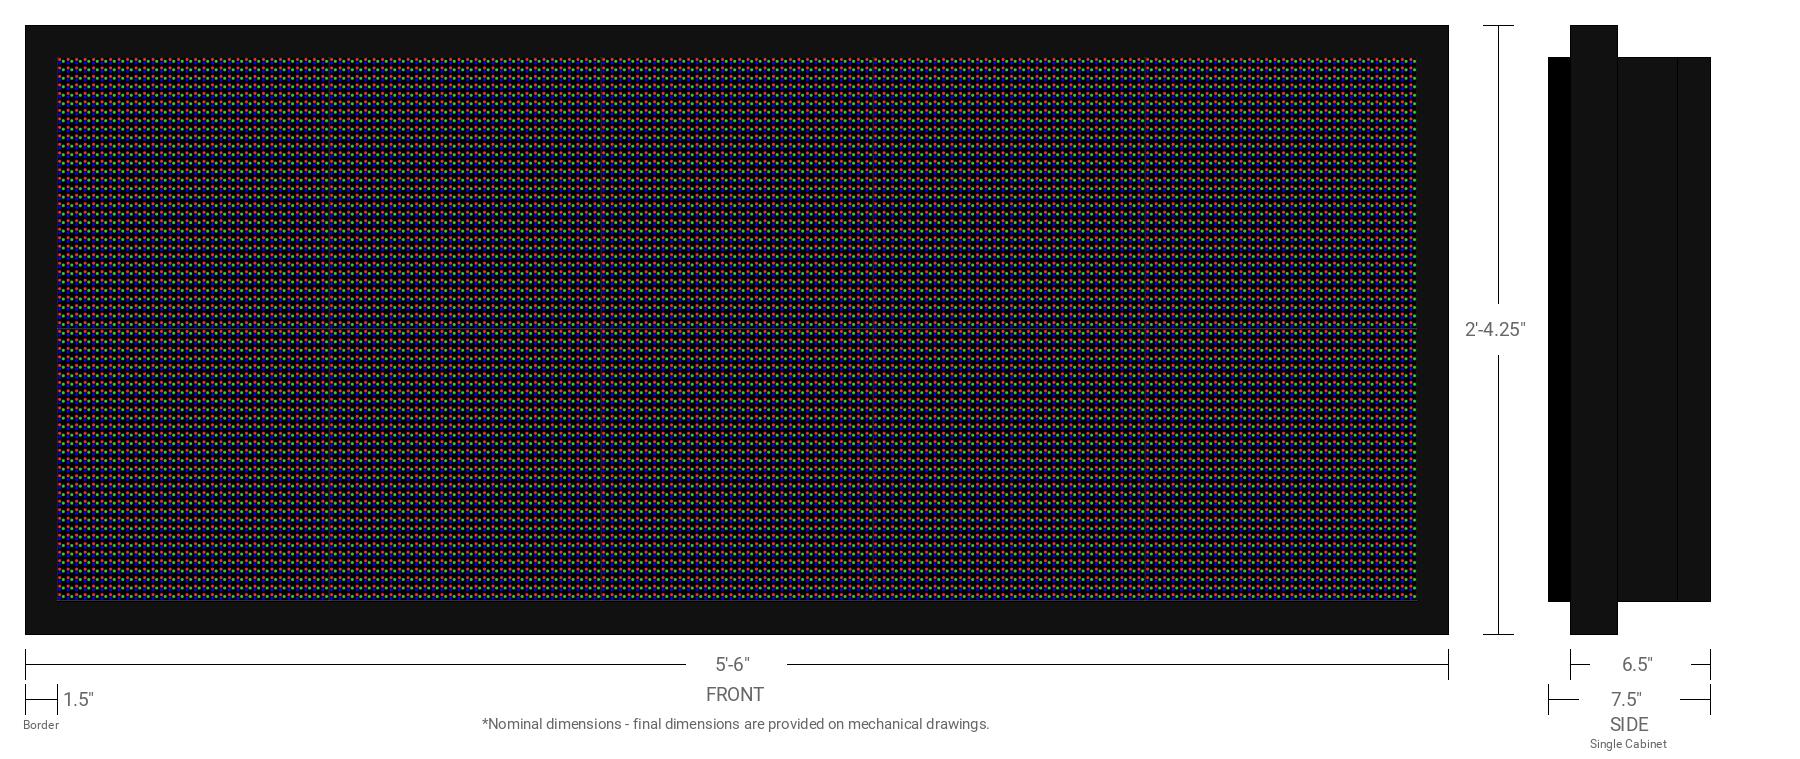 Polaris 10mm 64x160 Single Sided Full Color LED Display